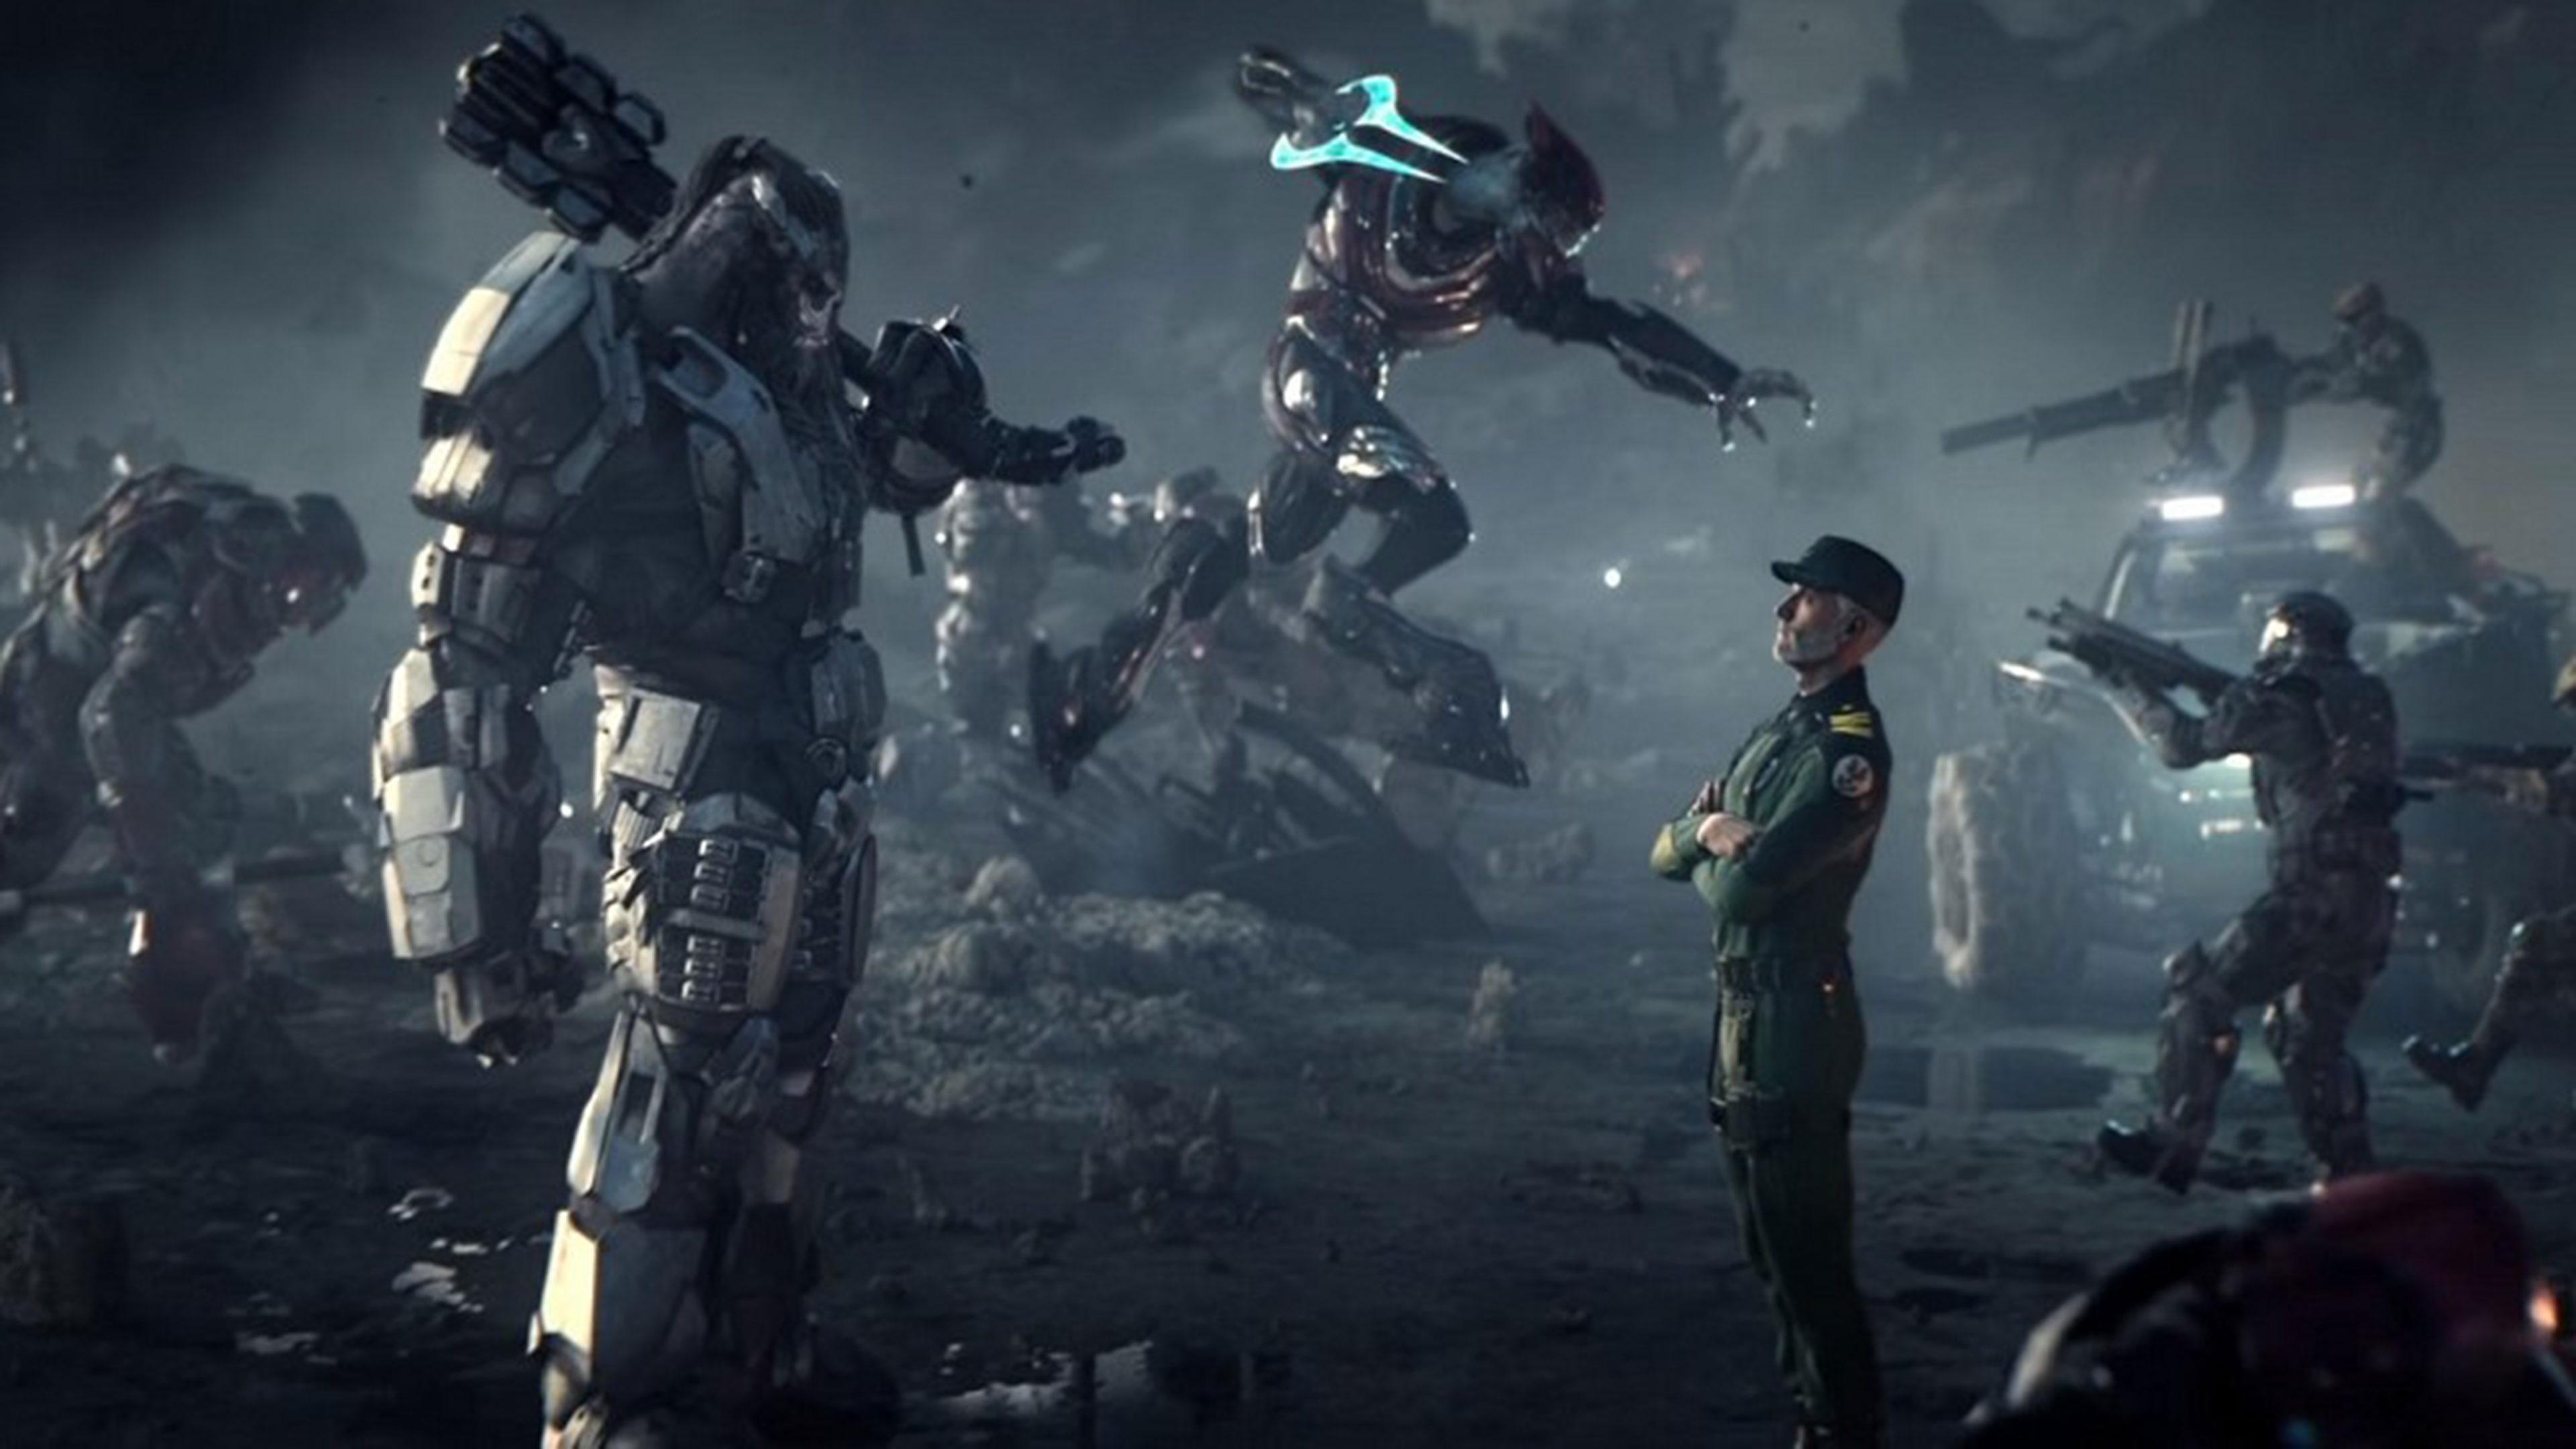 Halo 2 cartes de matchmaking